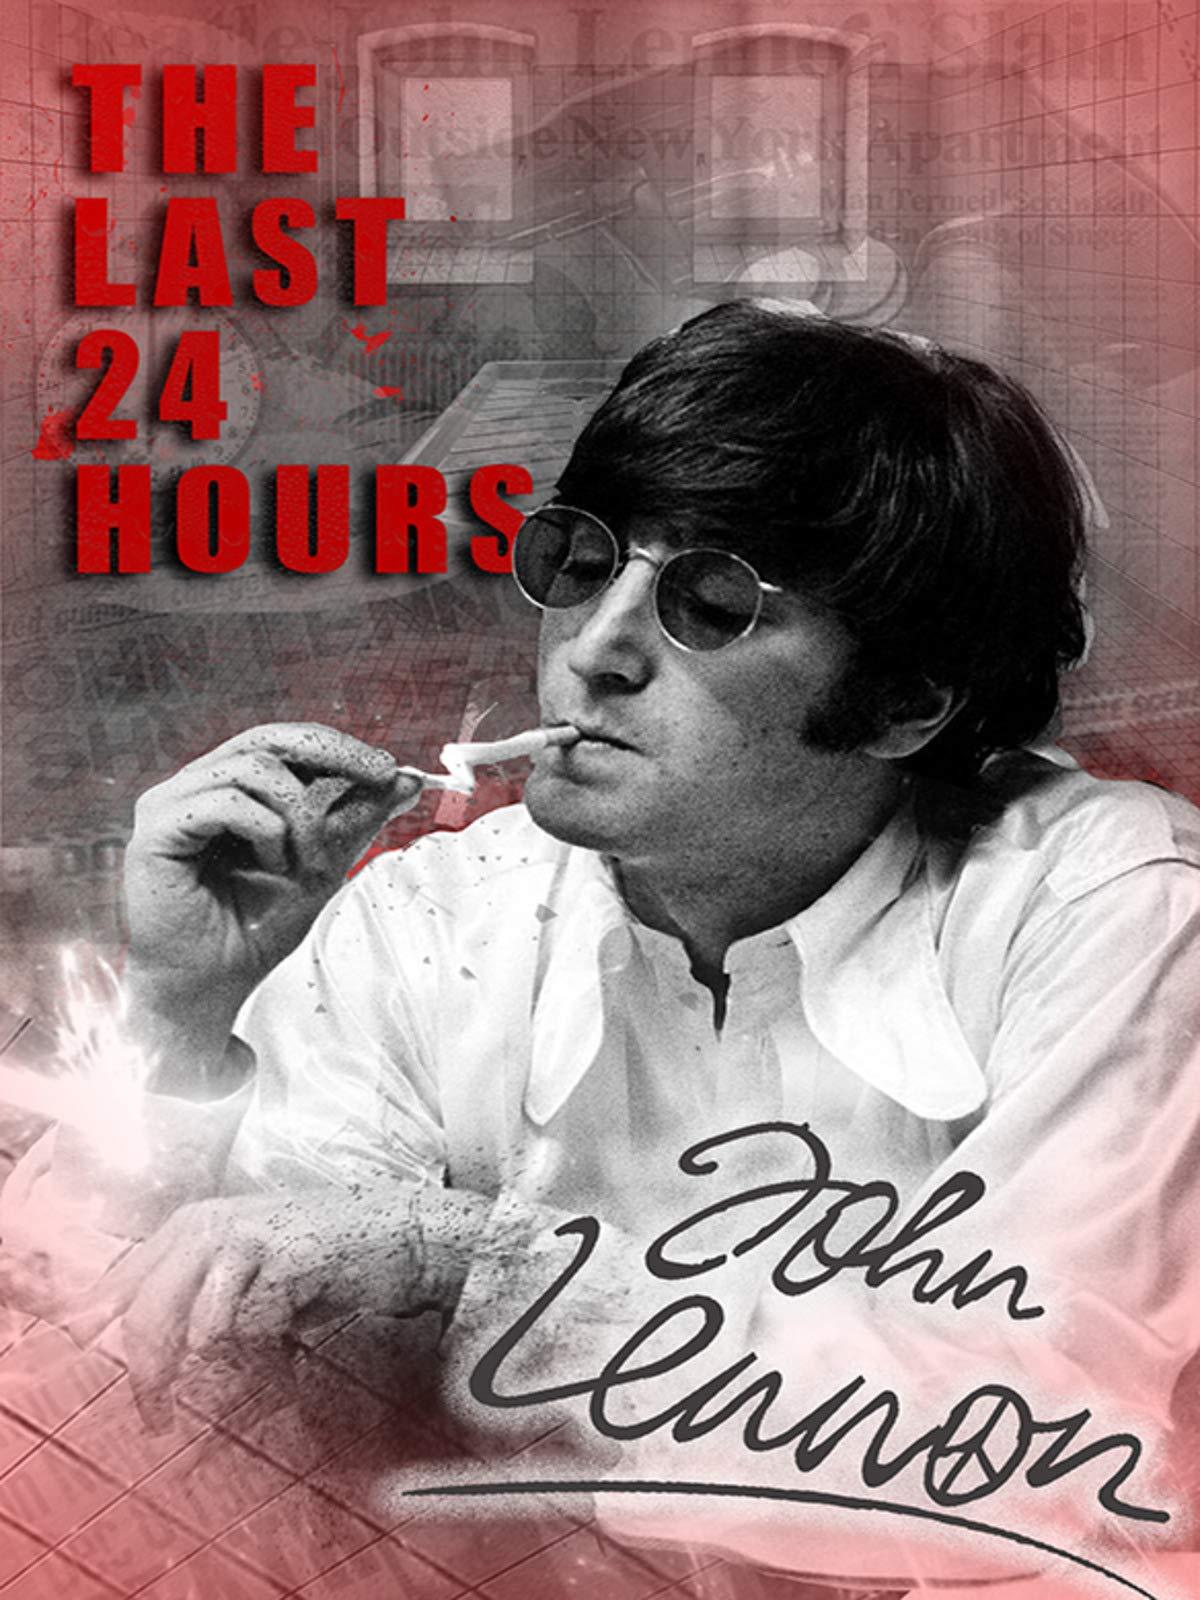 The Last 24 Hours: John Lennon on Amazon Prime Video UK